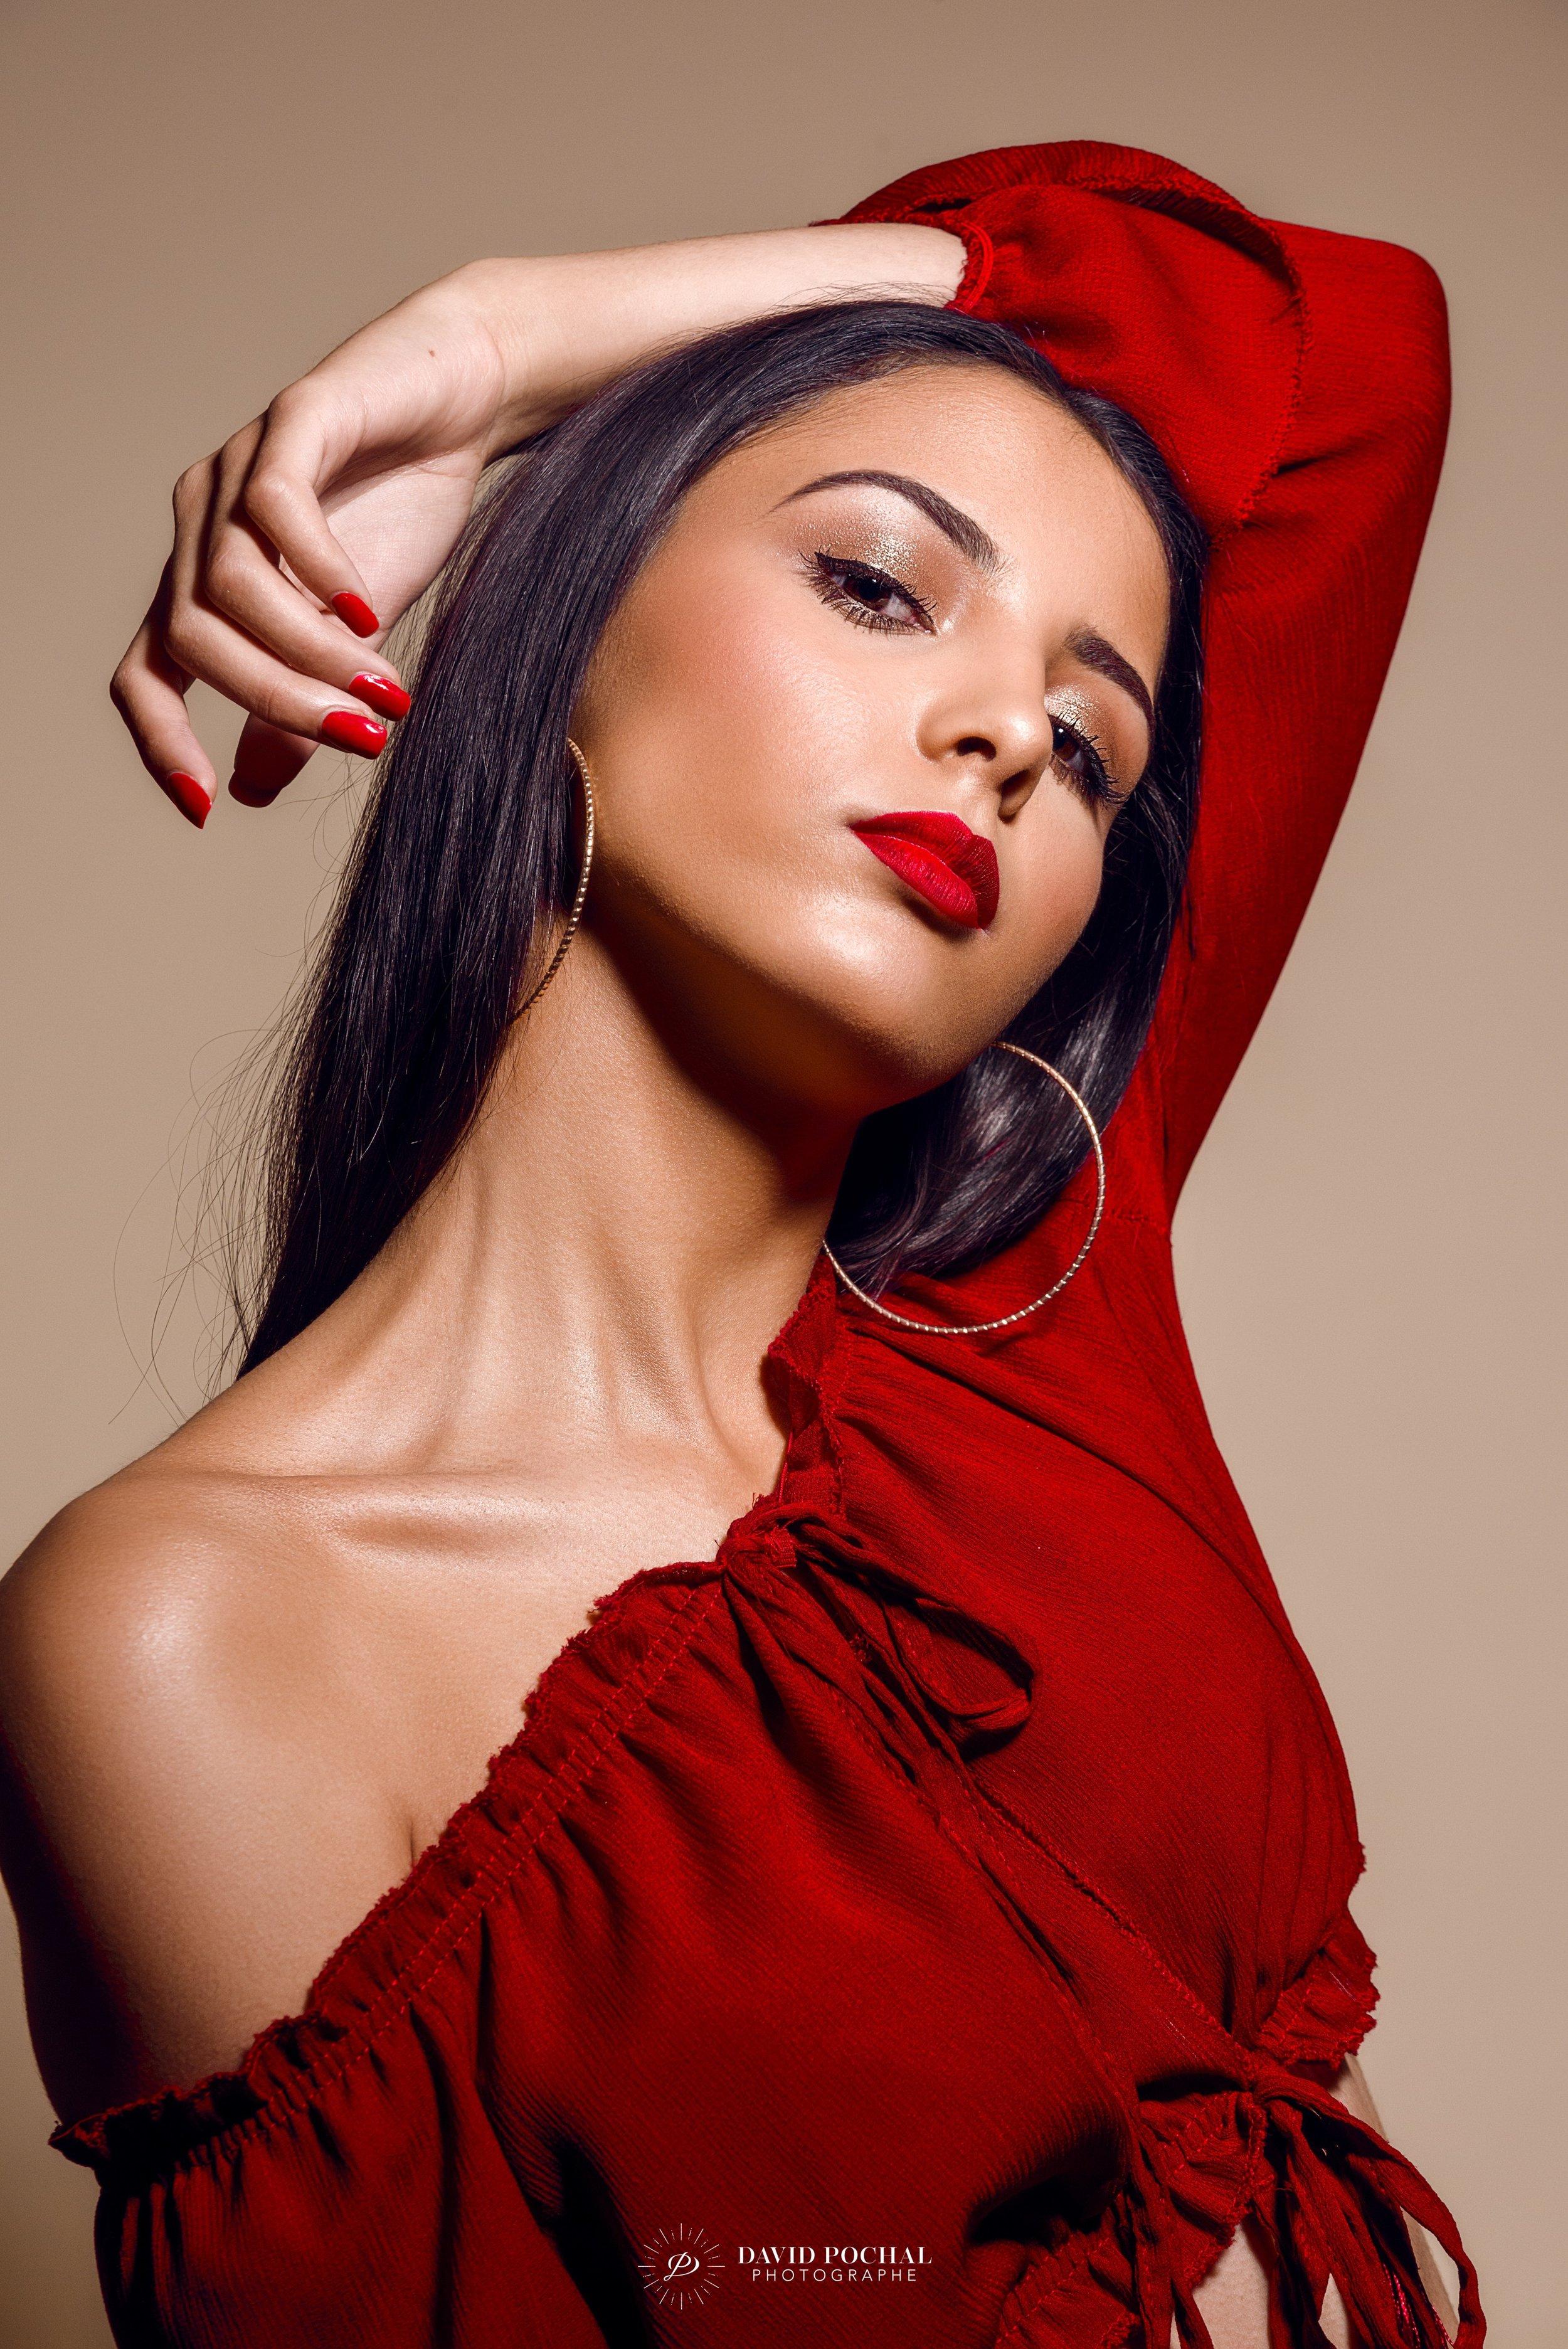 Amalie_goldand prestige_ Mode_portrait professionnel_By David Pochal Photographe_By David Pochal.jpg